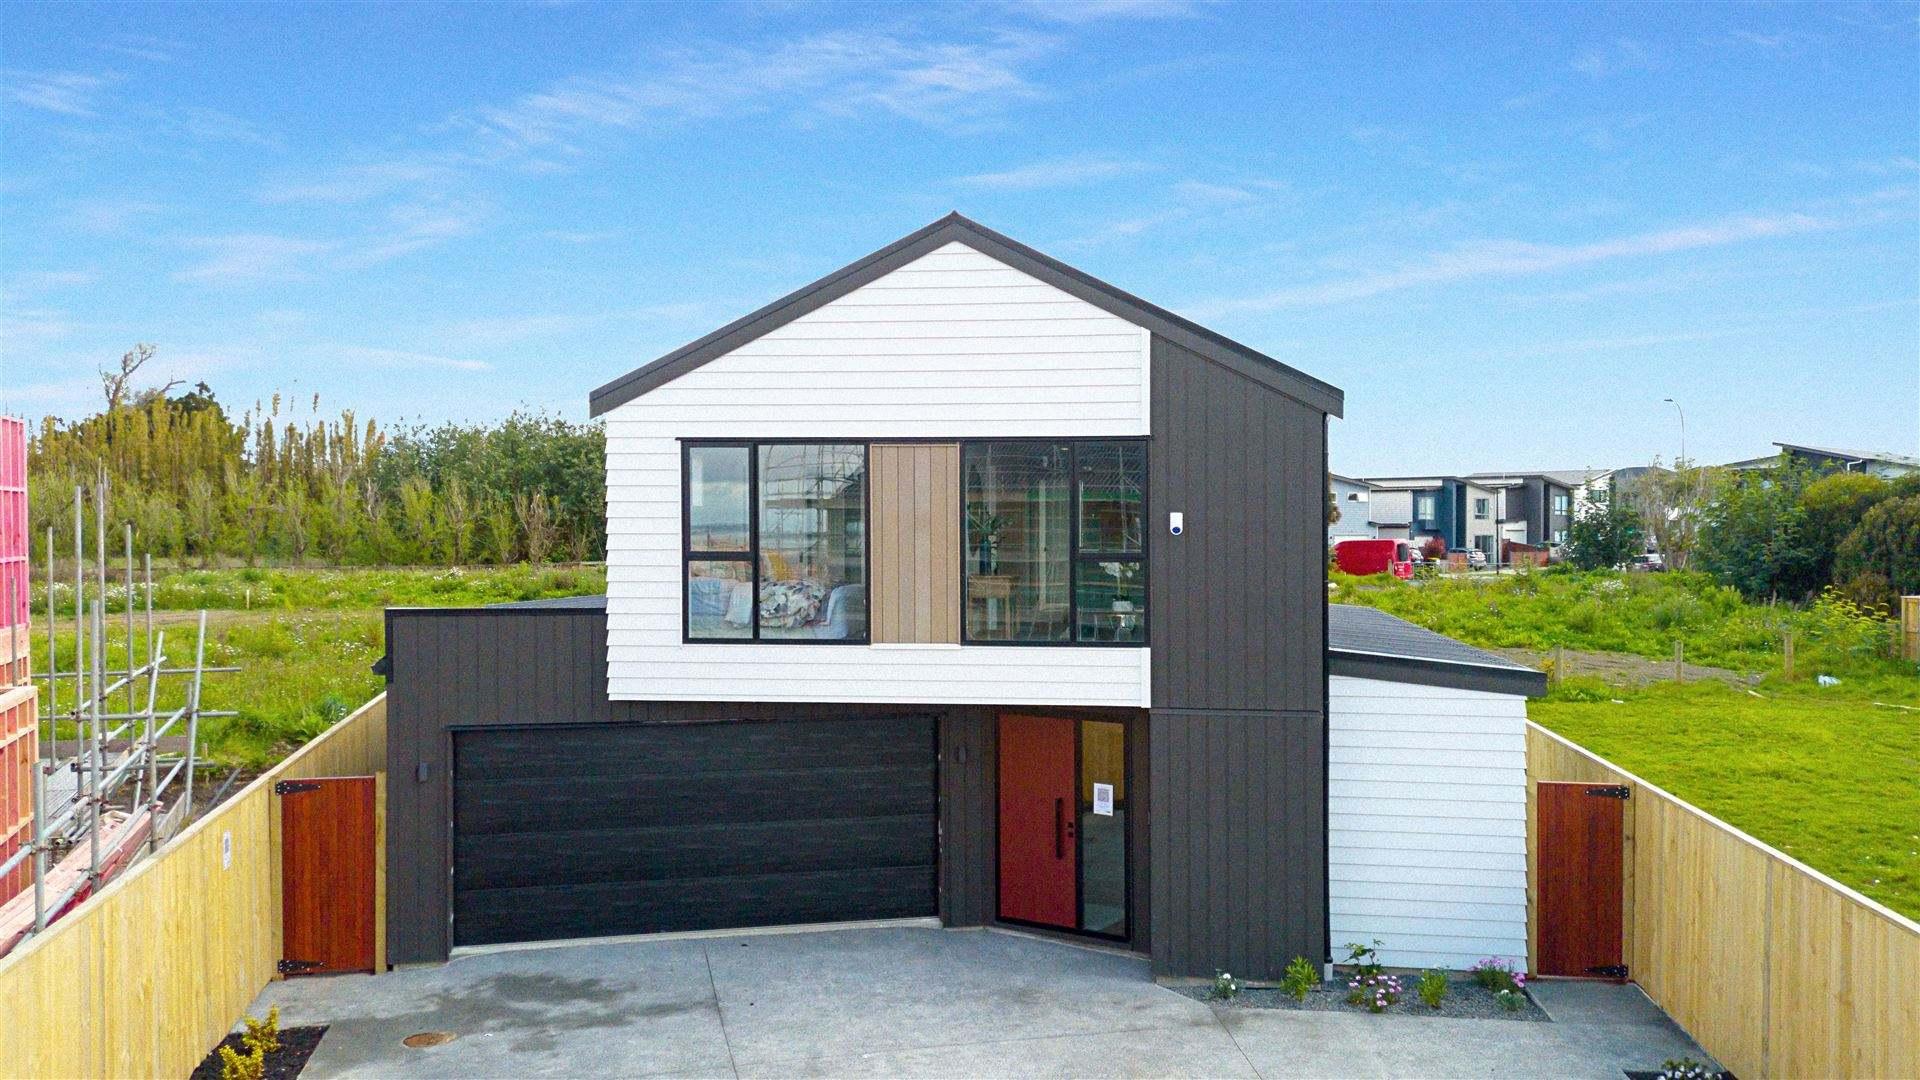 Hobsonville 5房 全新海景奢居 高端装潢 细节无懈可击 10分学区+一流配套 生活惬意多彩! Fabulous Brand New Home with Sea Views